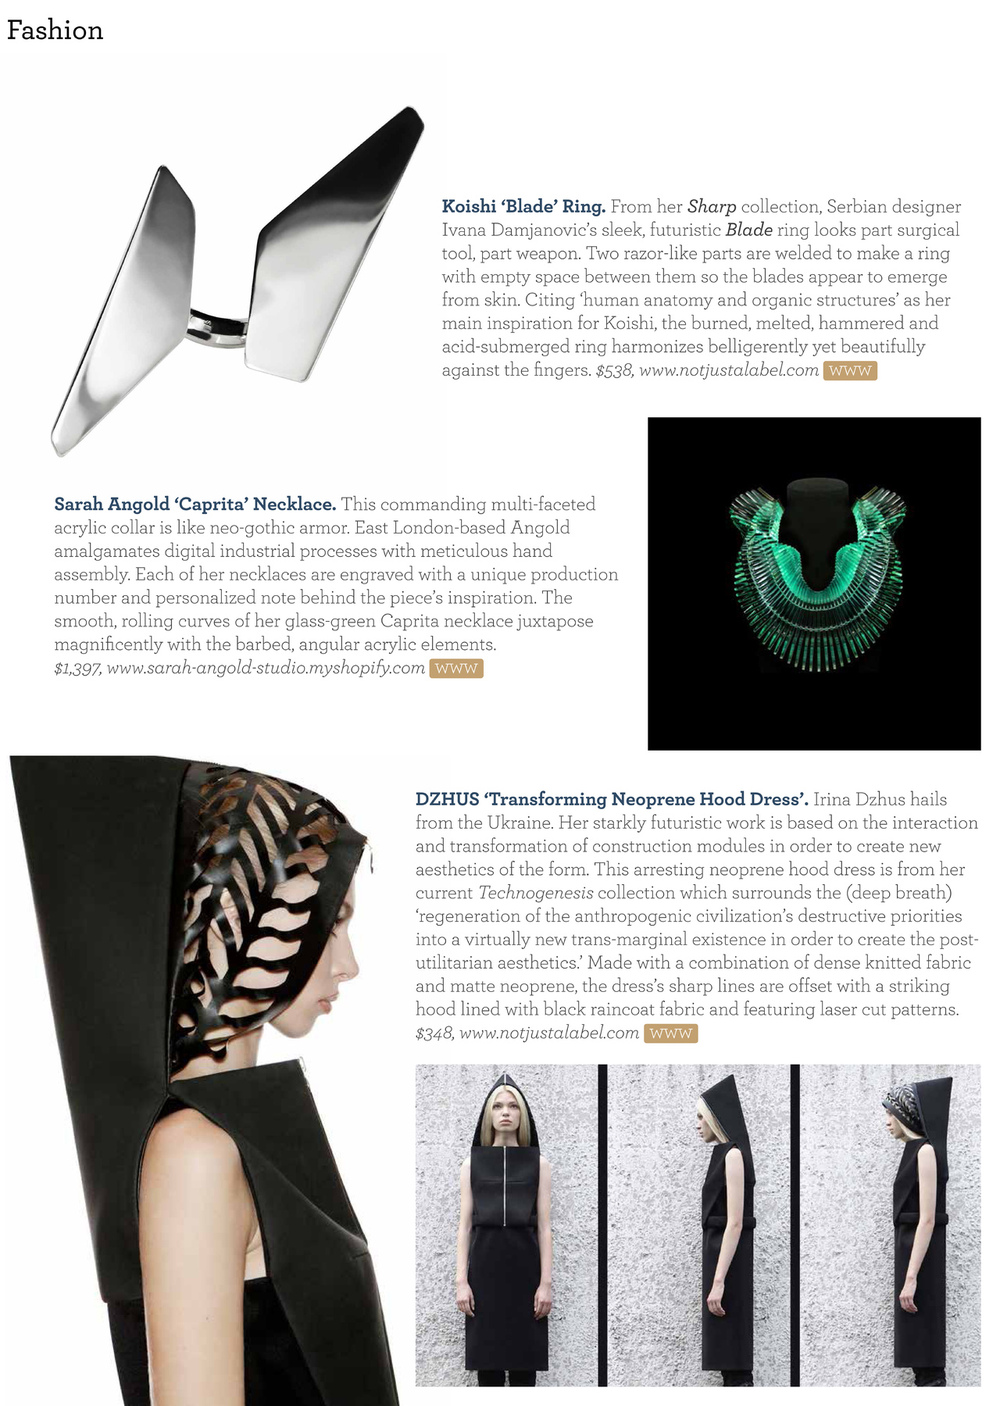 DZHUS - Lifestyle For Women Magazine (UK)